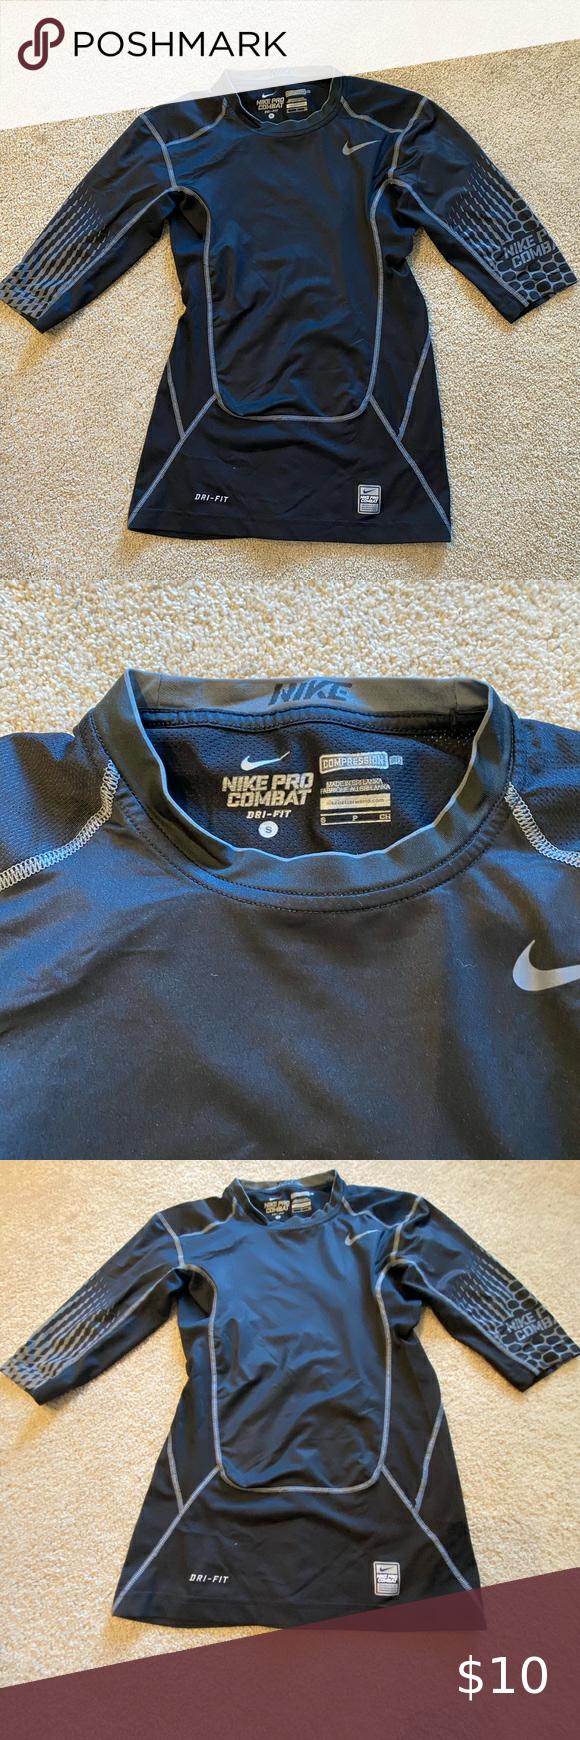 Nike Pro Combat Shirt Nike Pro Combat Combat Shirt Nike Pros [ 1740 x 580 Pixel ]